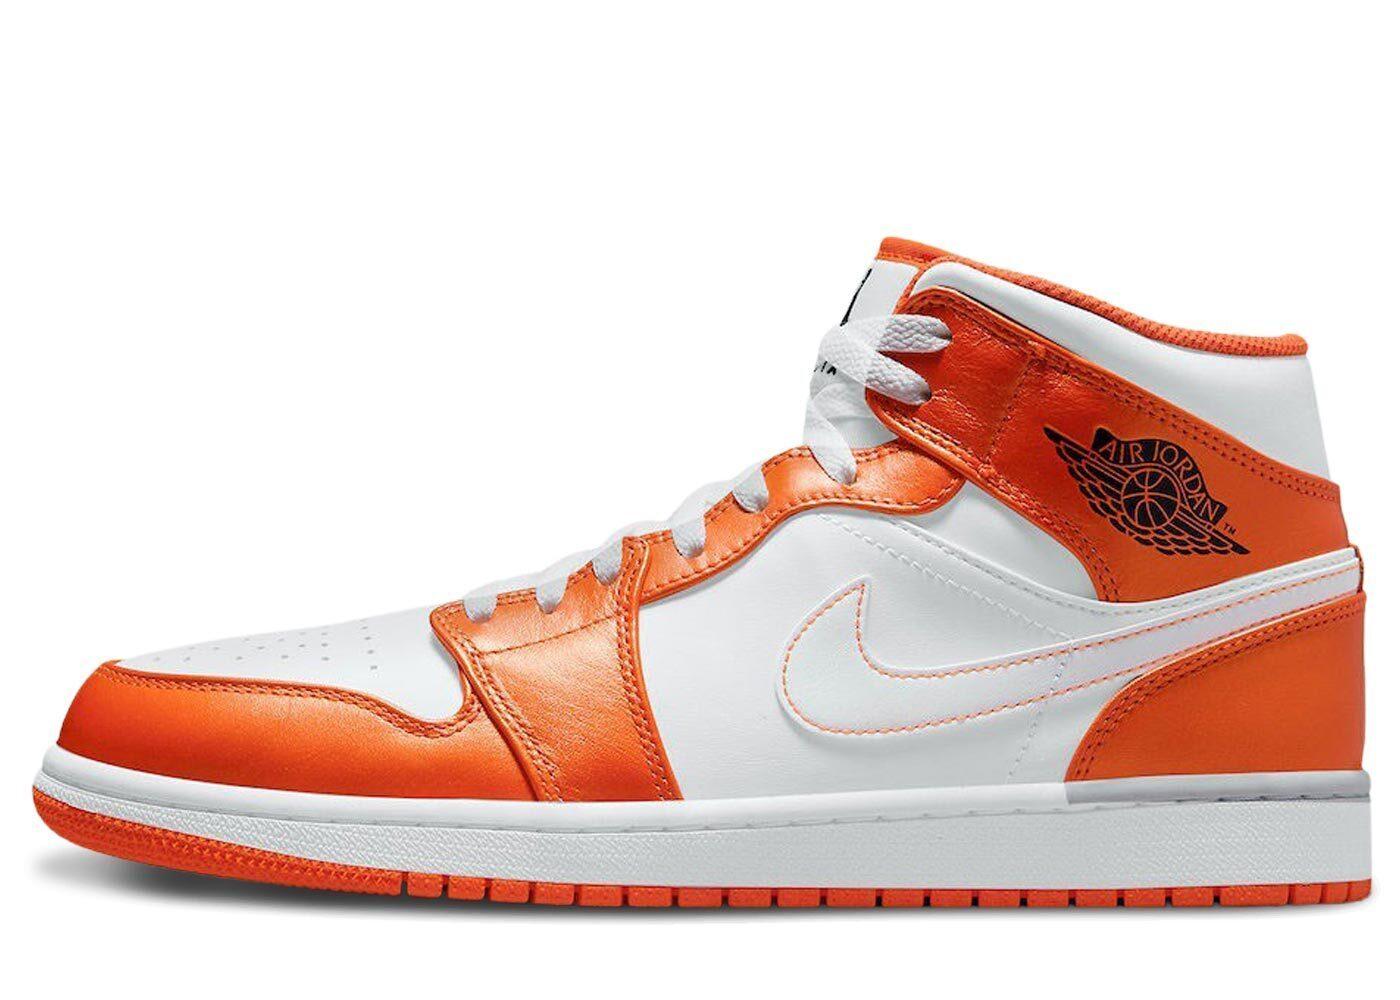 Nike Air Jordan 1 Mid SE White Orangeの写真